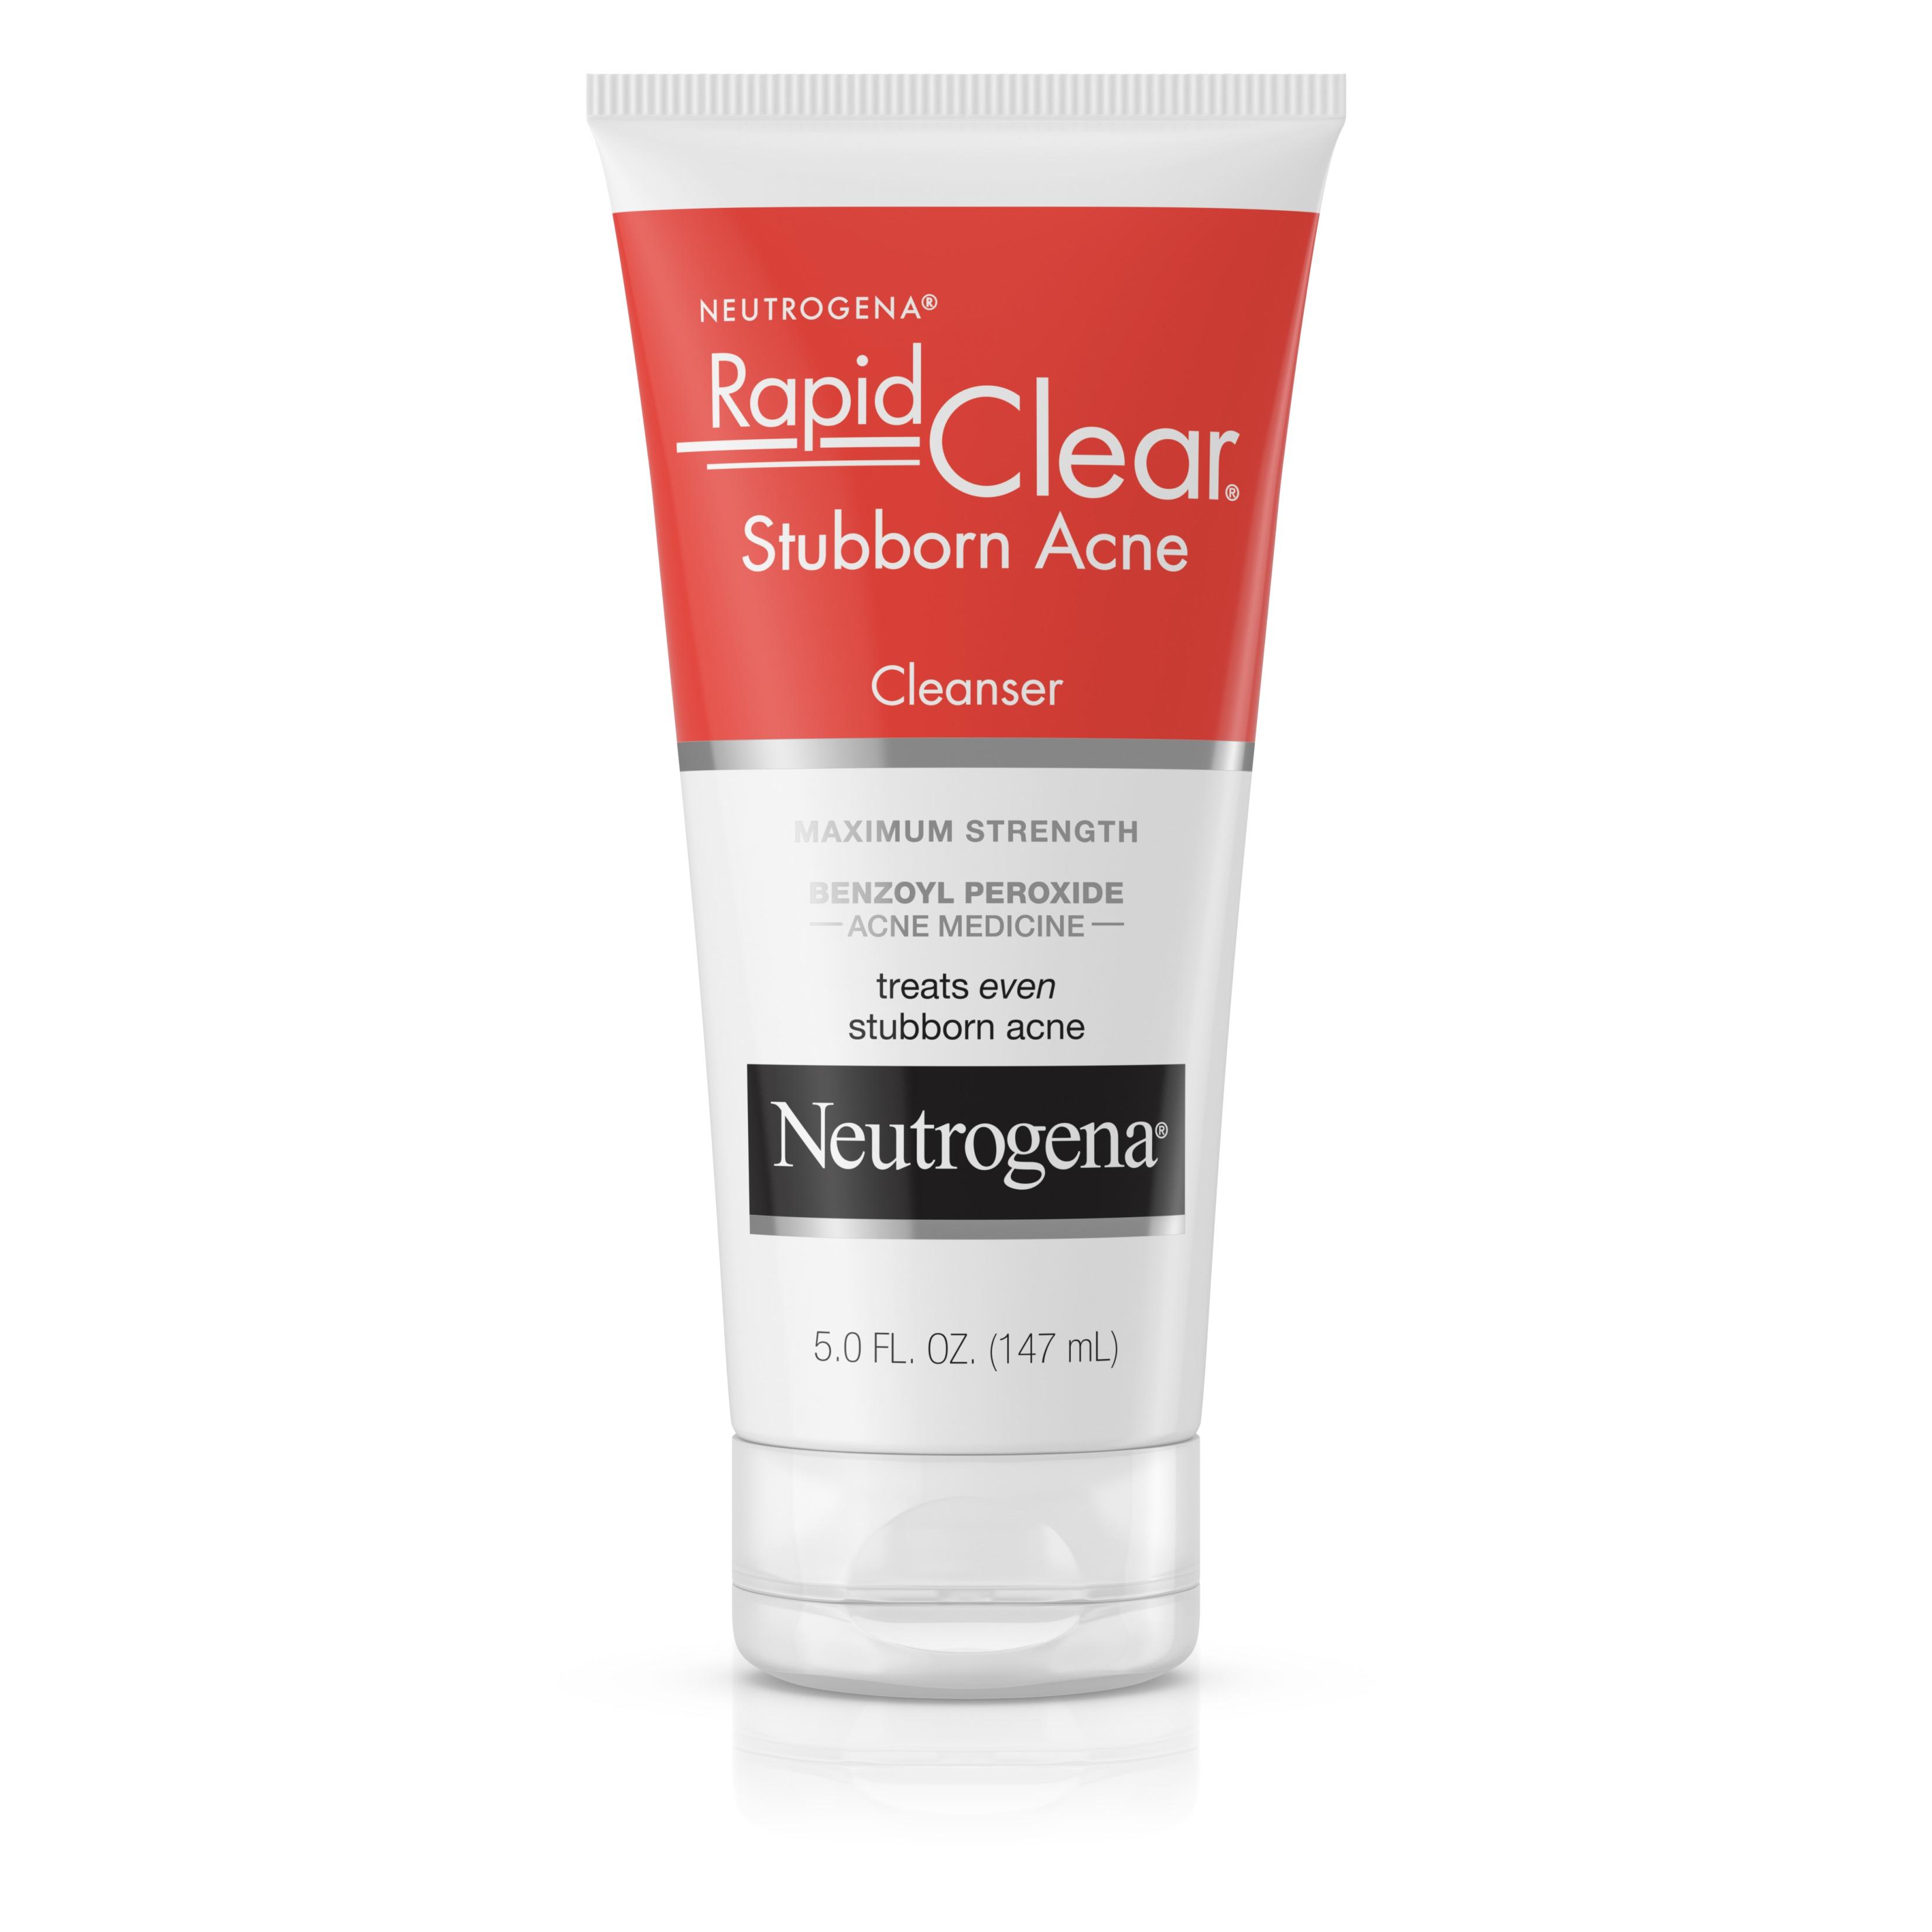 Neutrogena Rapid Clear Stubborn Acne Cleanser, 5 Oz - Walmart.com